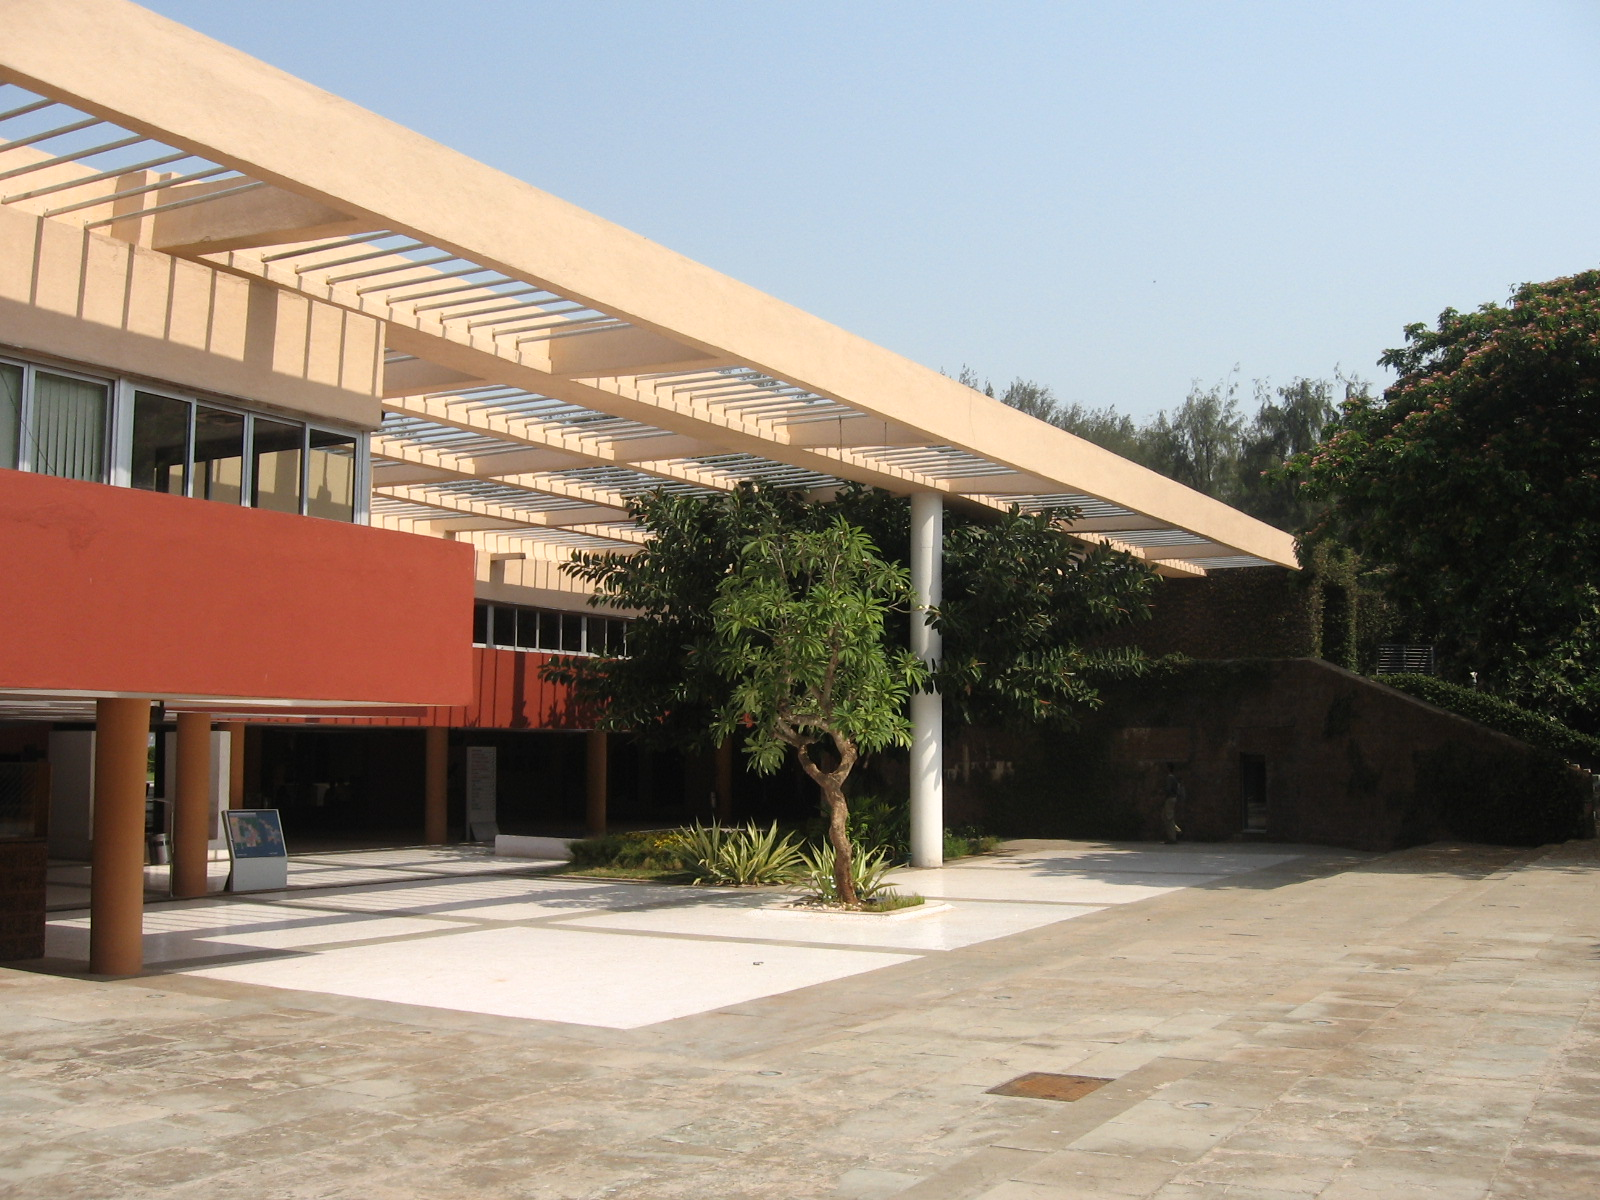 ARCHITECTURE STUDENT'S CORNER: CHARLES CORREA - KALA ACADEMY